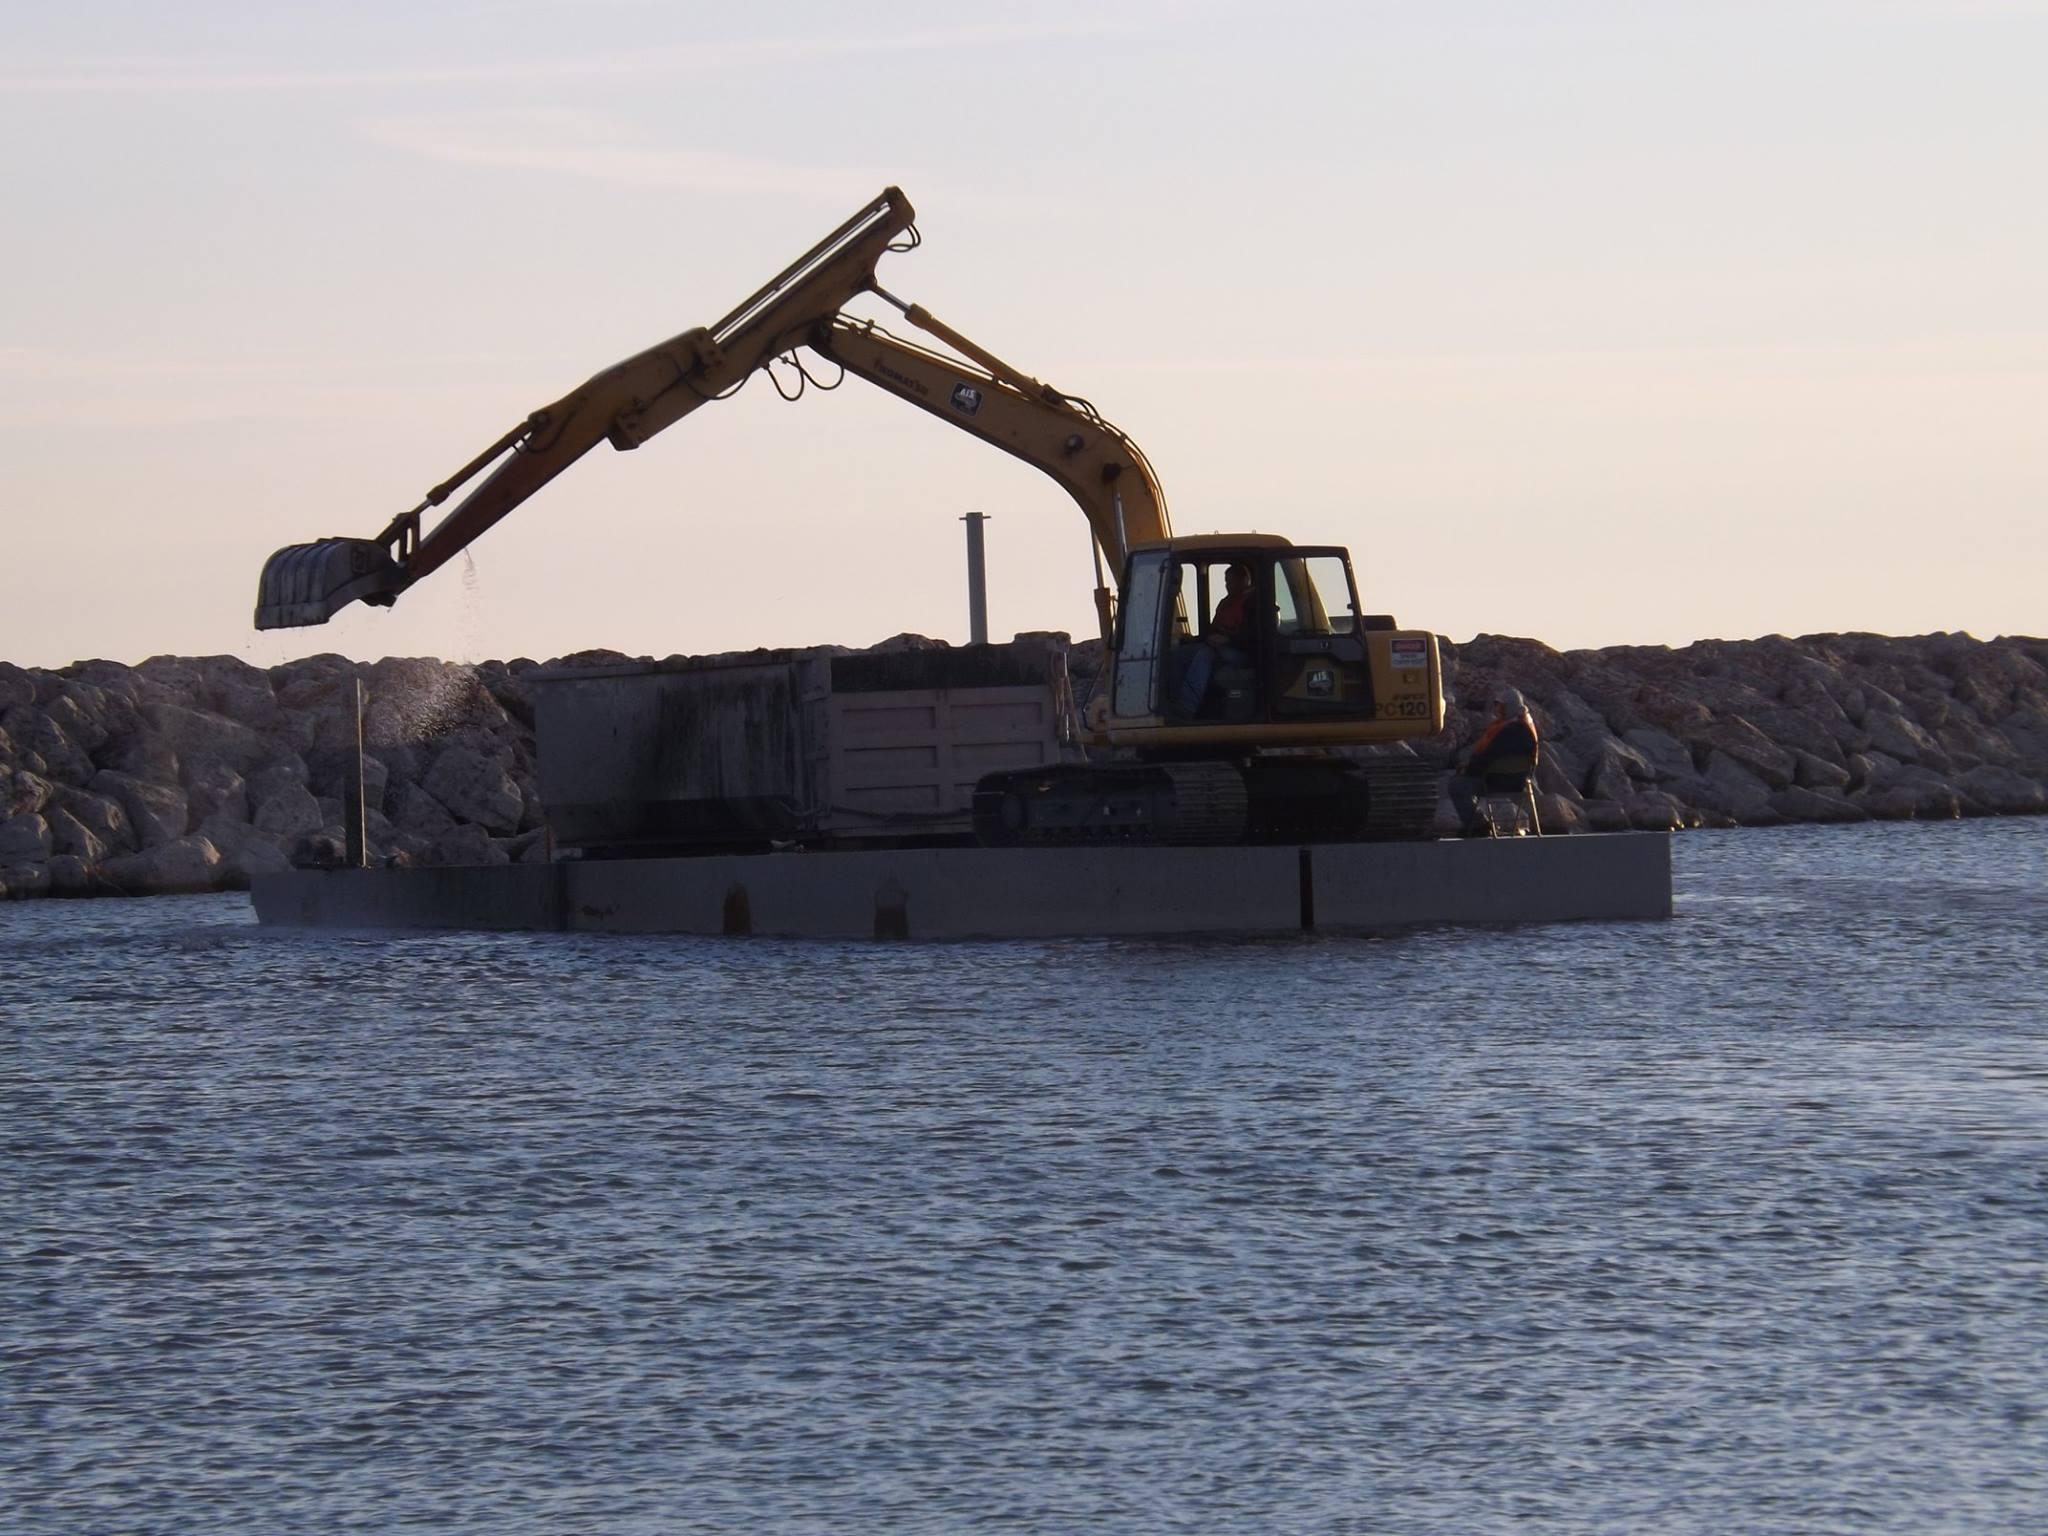 Dredging the Harbor